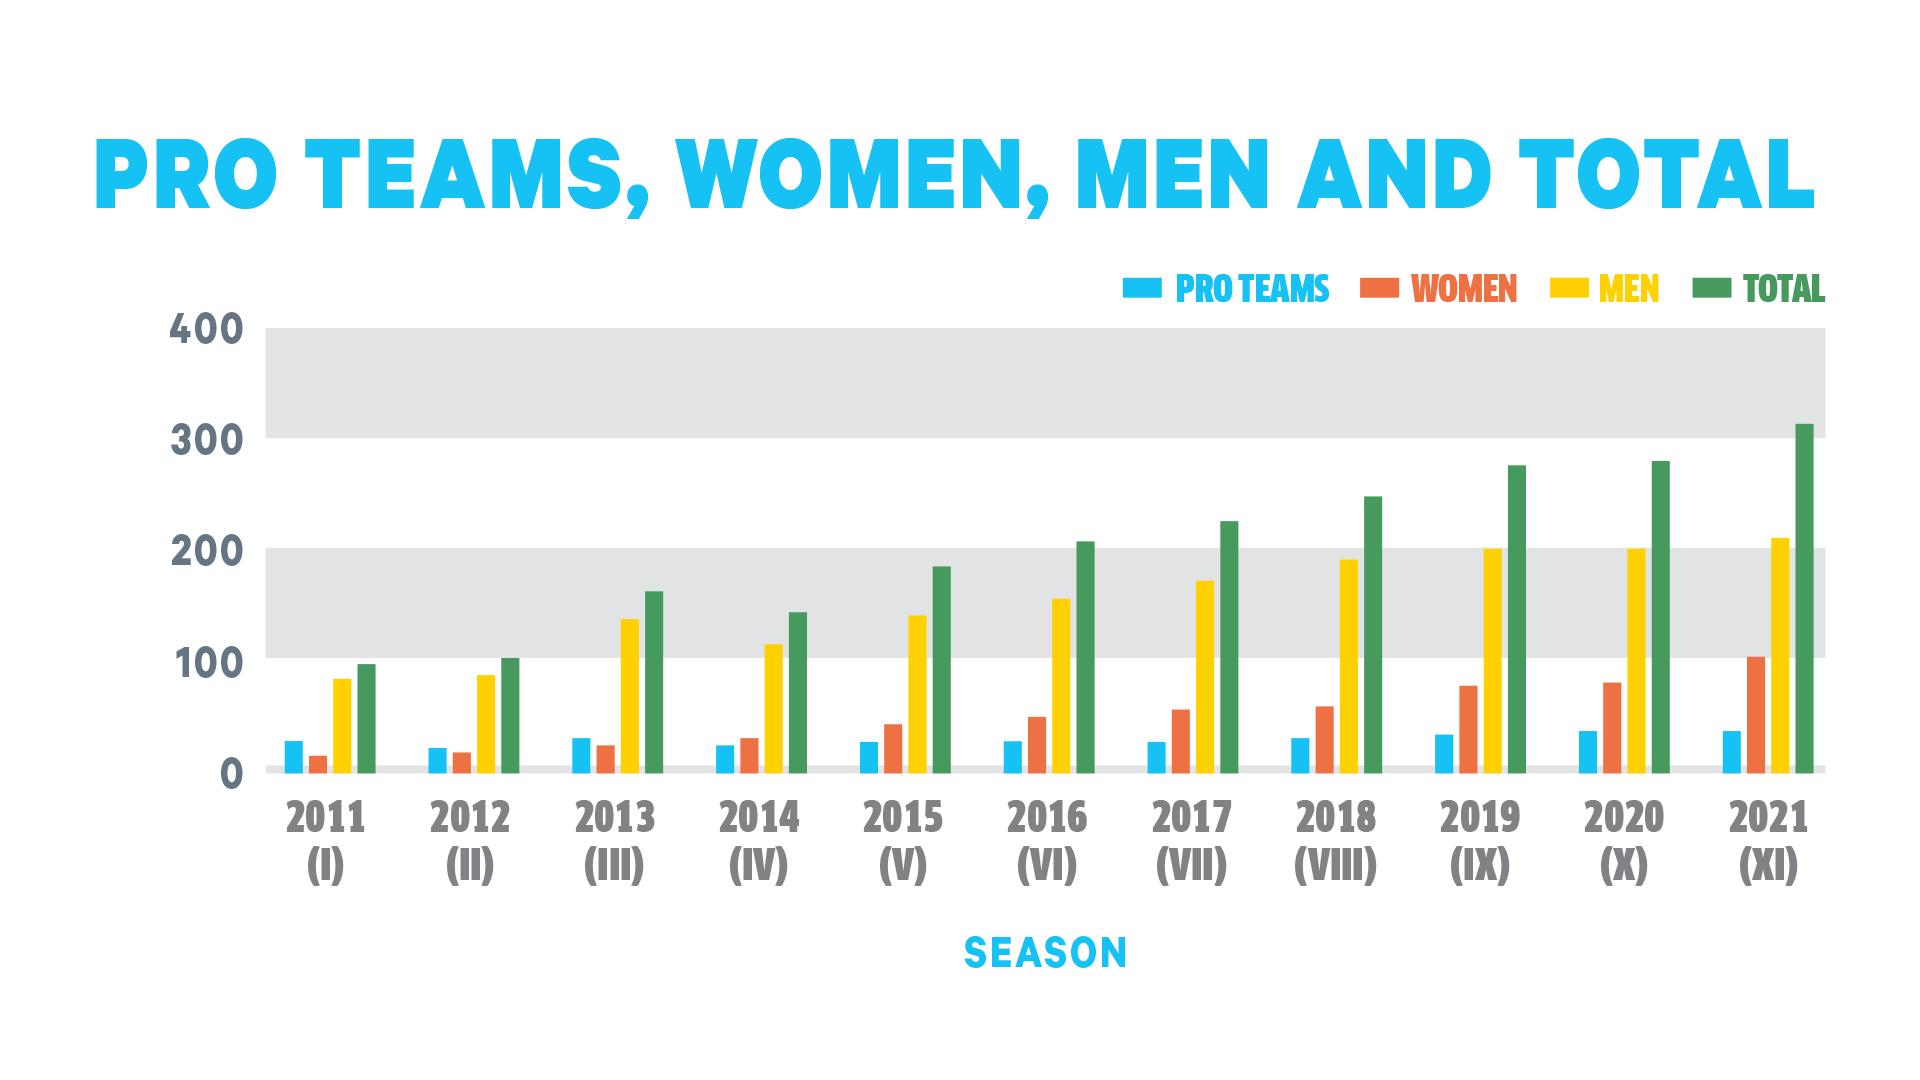 1920x1080_Pro Teams, women, men and total graf.png